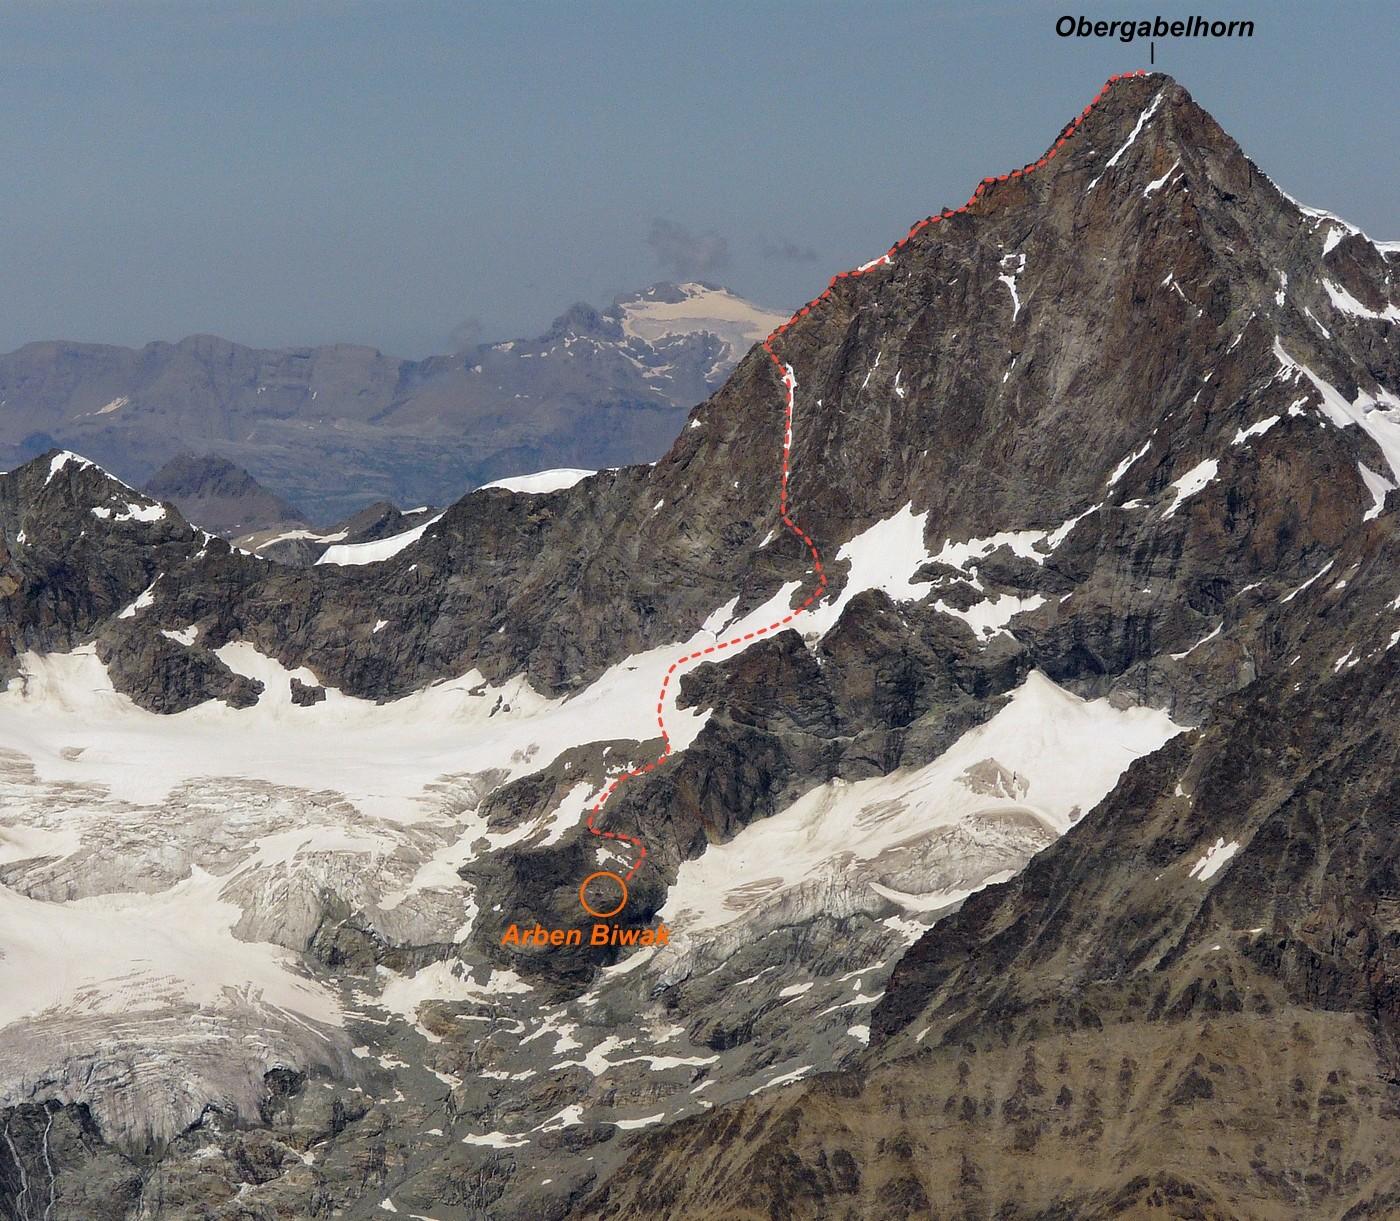 Ober Gabelhorn - Arbengrat